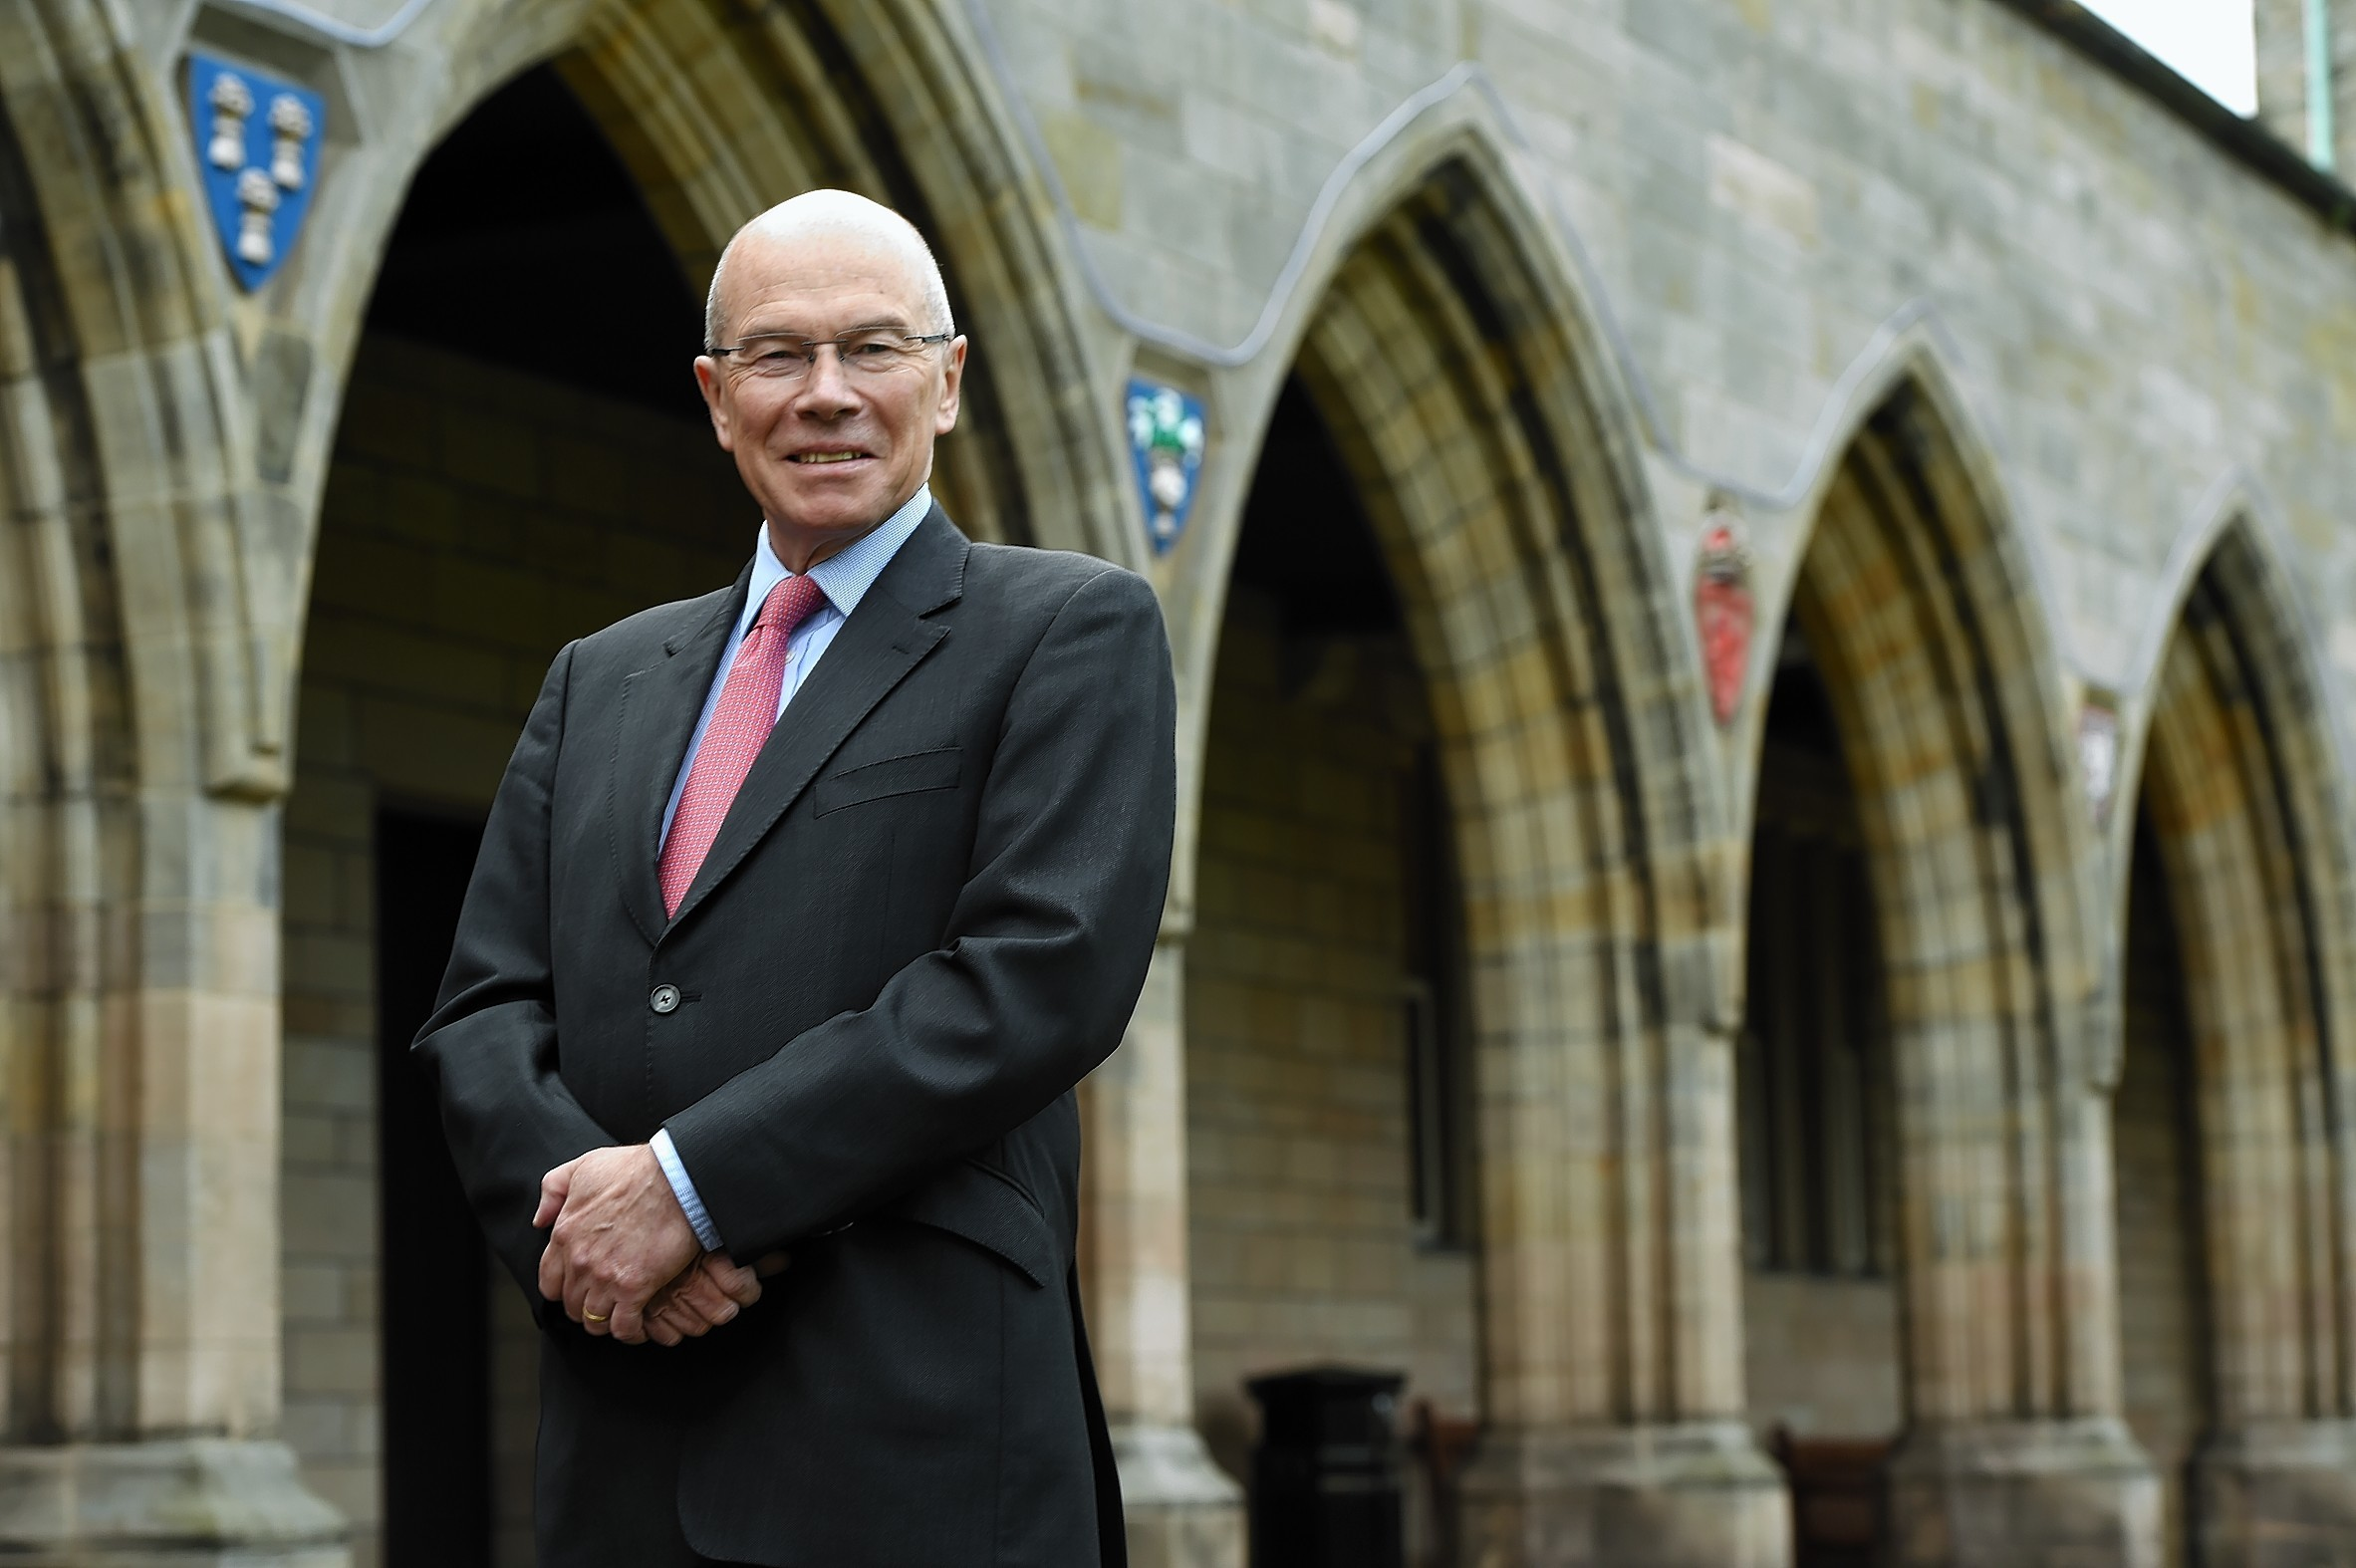 Paul Warwick, executive director of Whalsay Energy